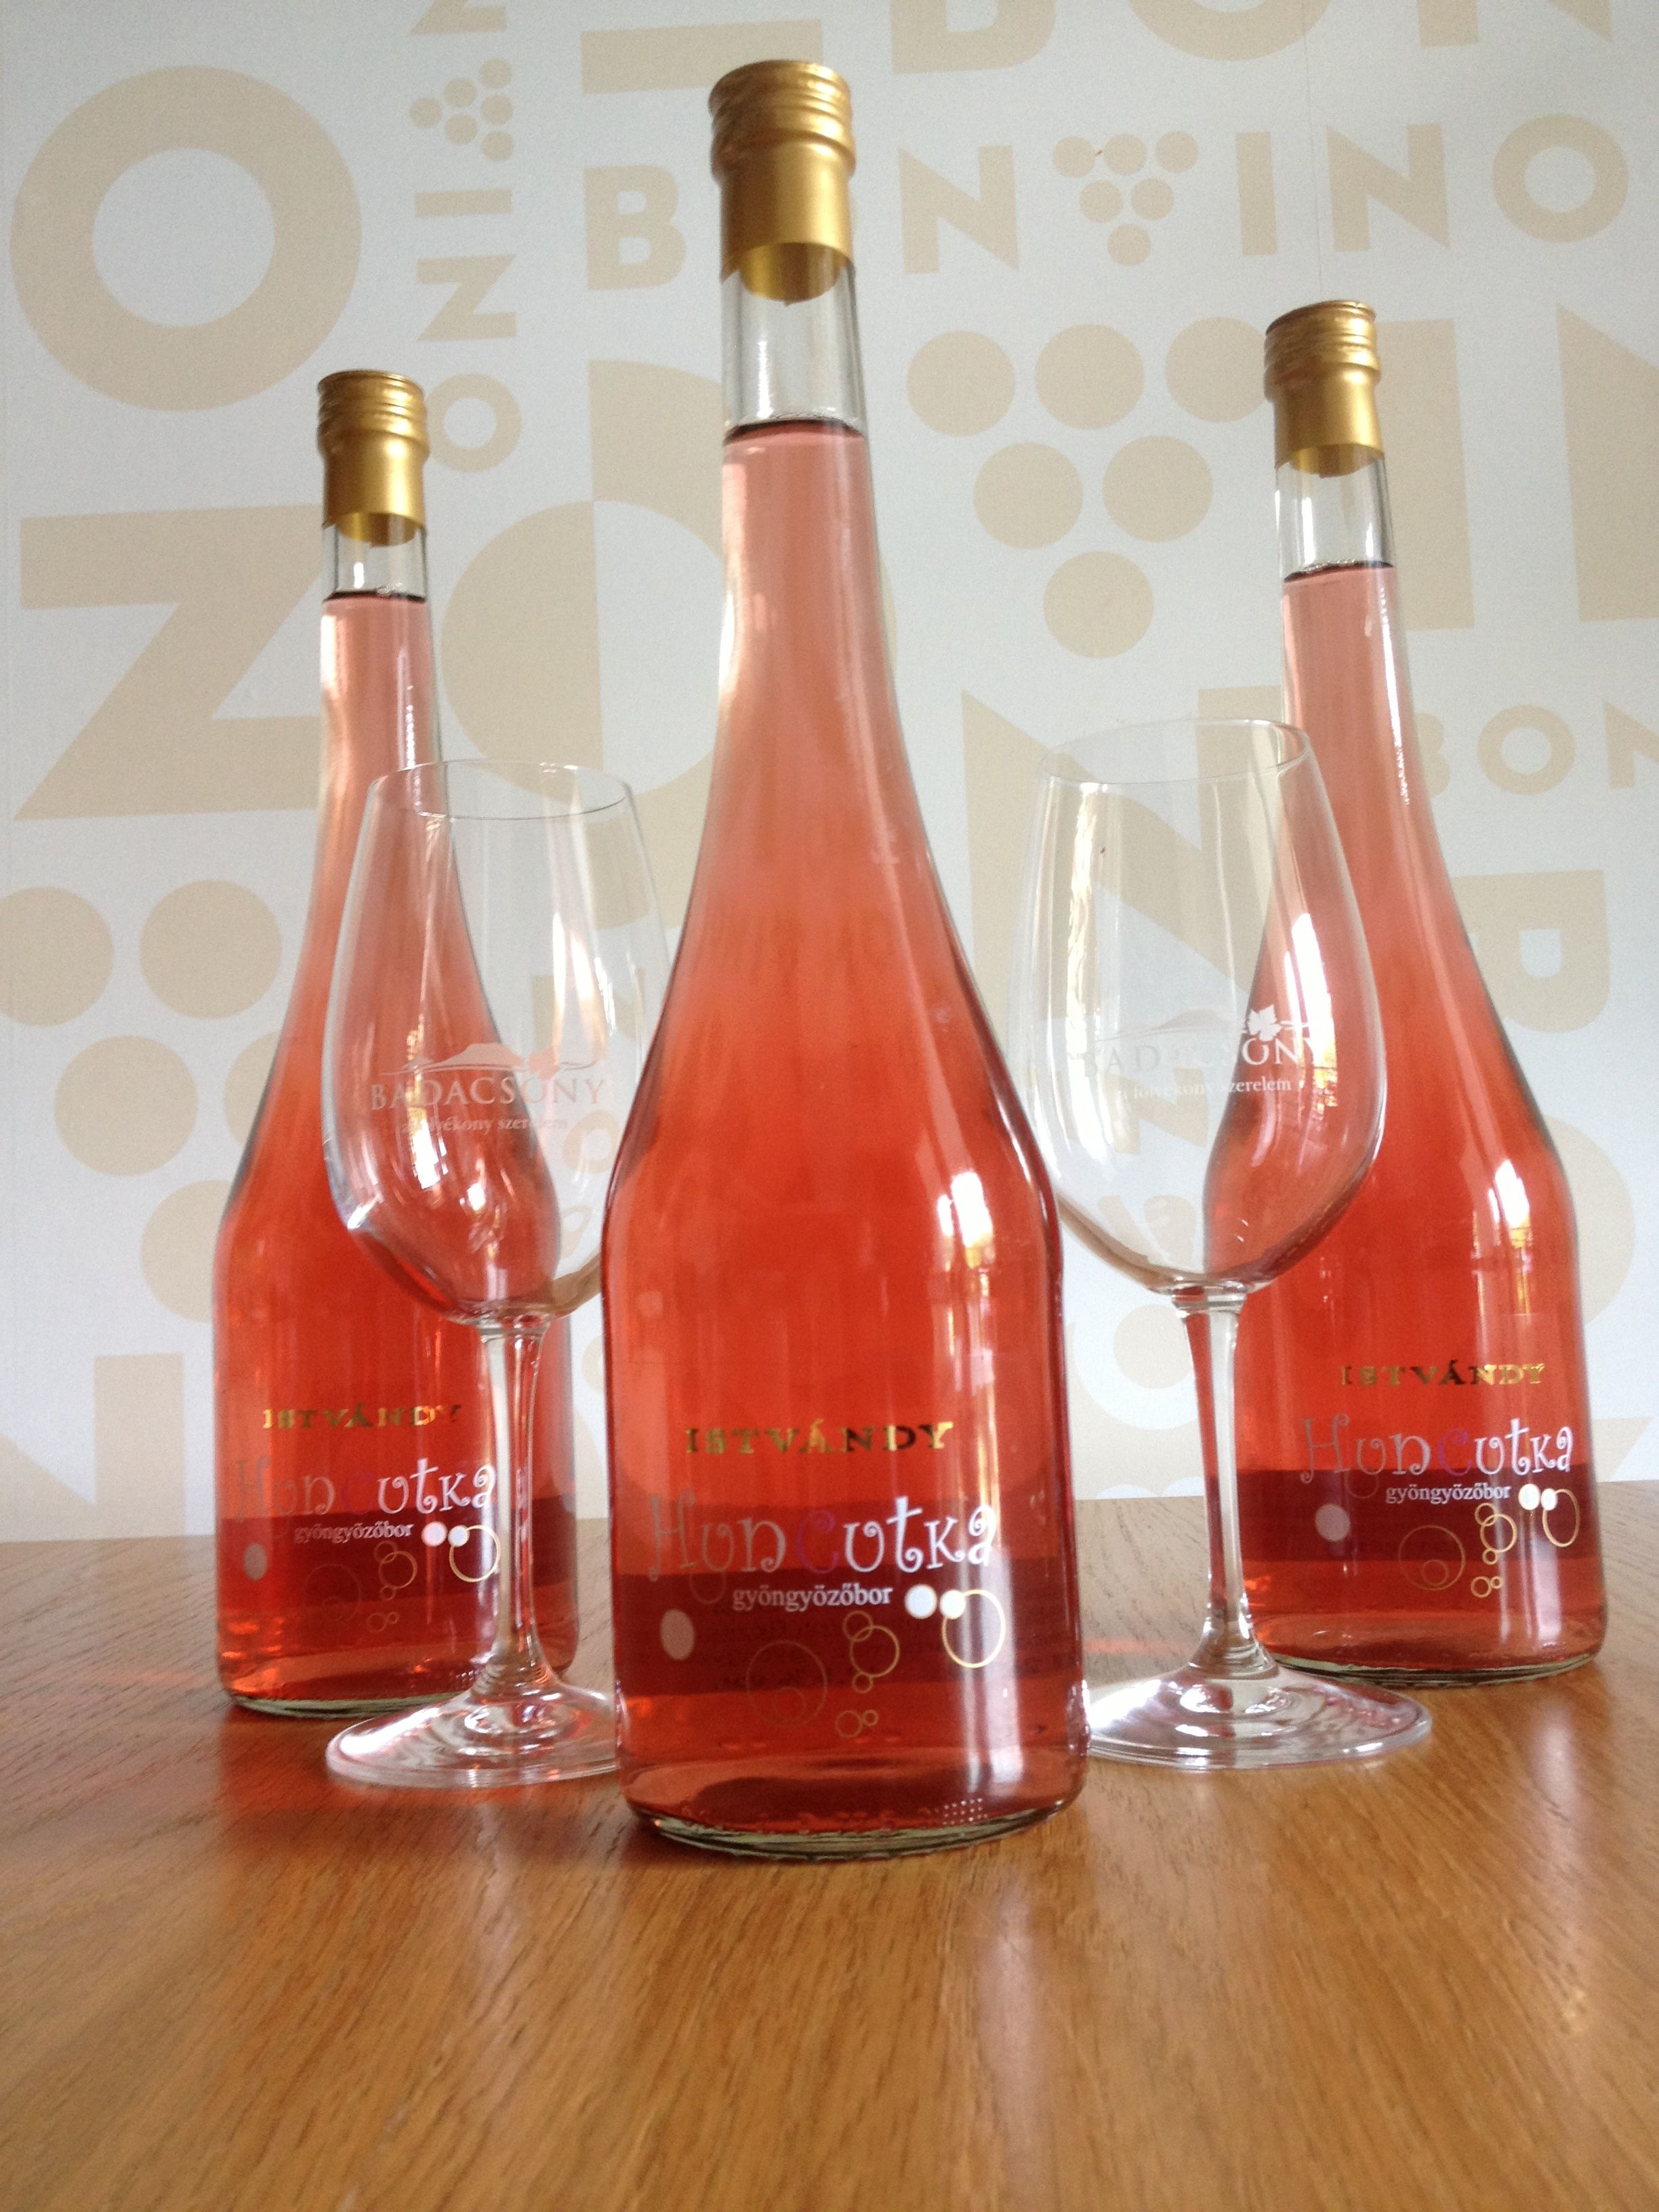 Huncutka Sparkling Wine From Istvandy Estate Wine Bottle Wine Rose Wine Bottle